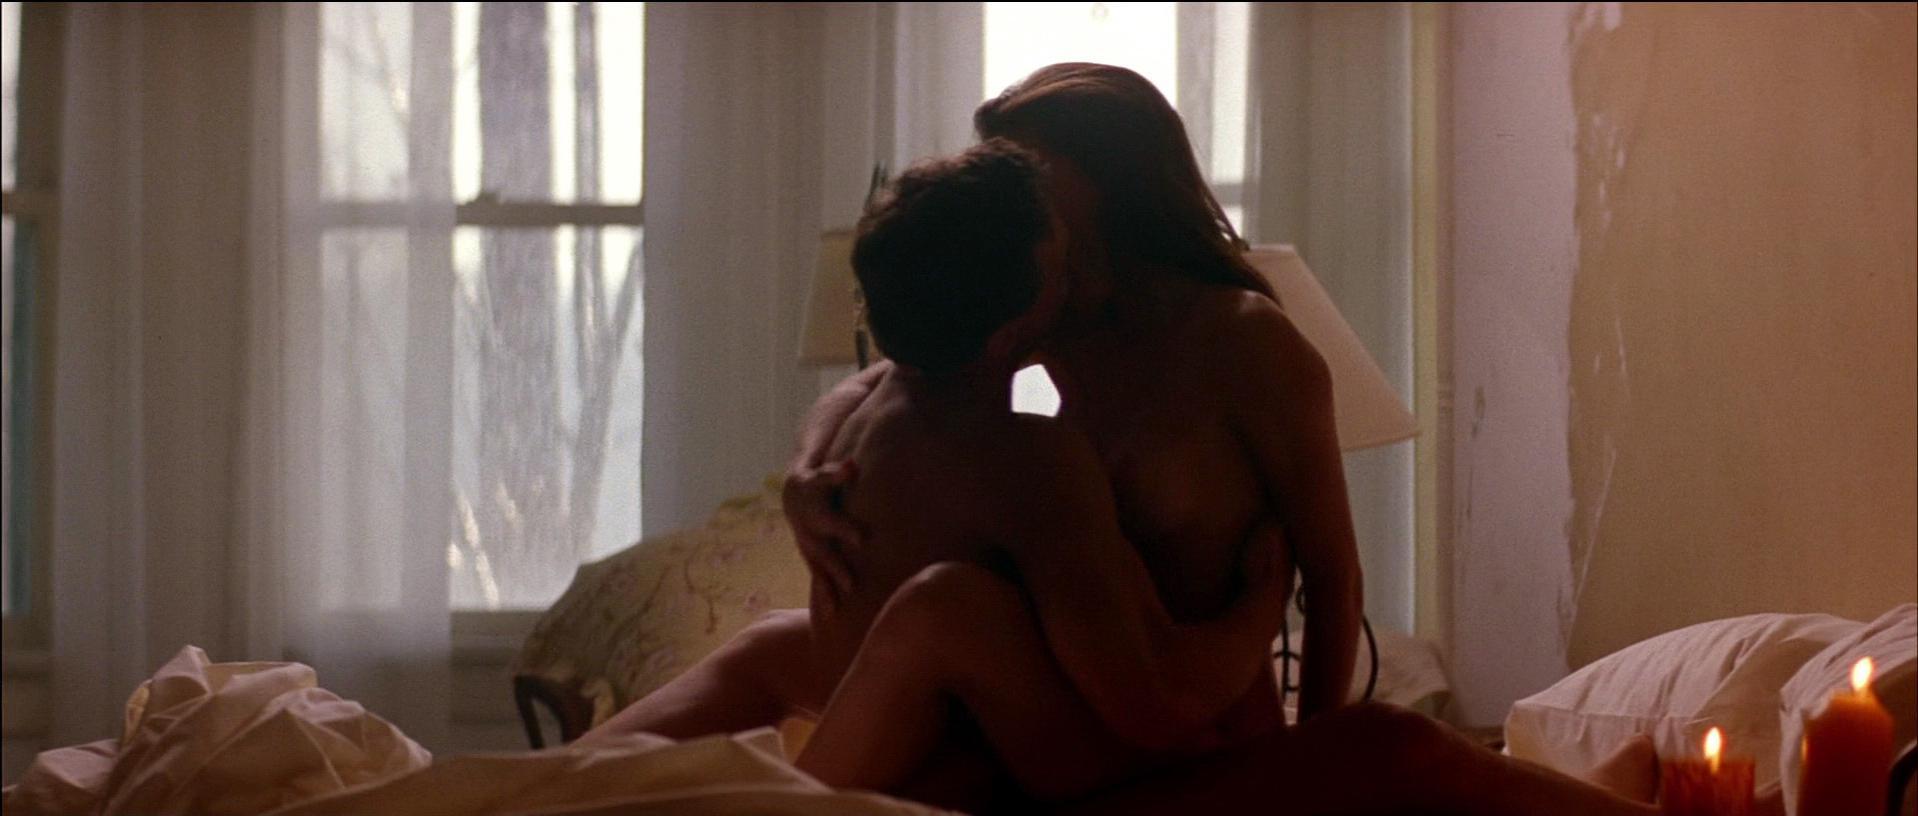 mia sara nude sex scene